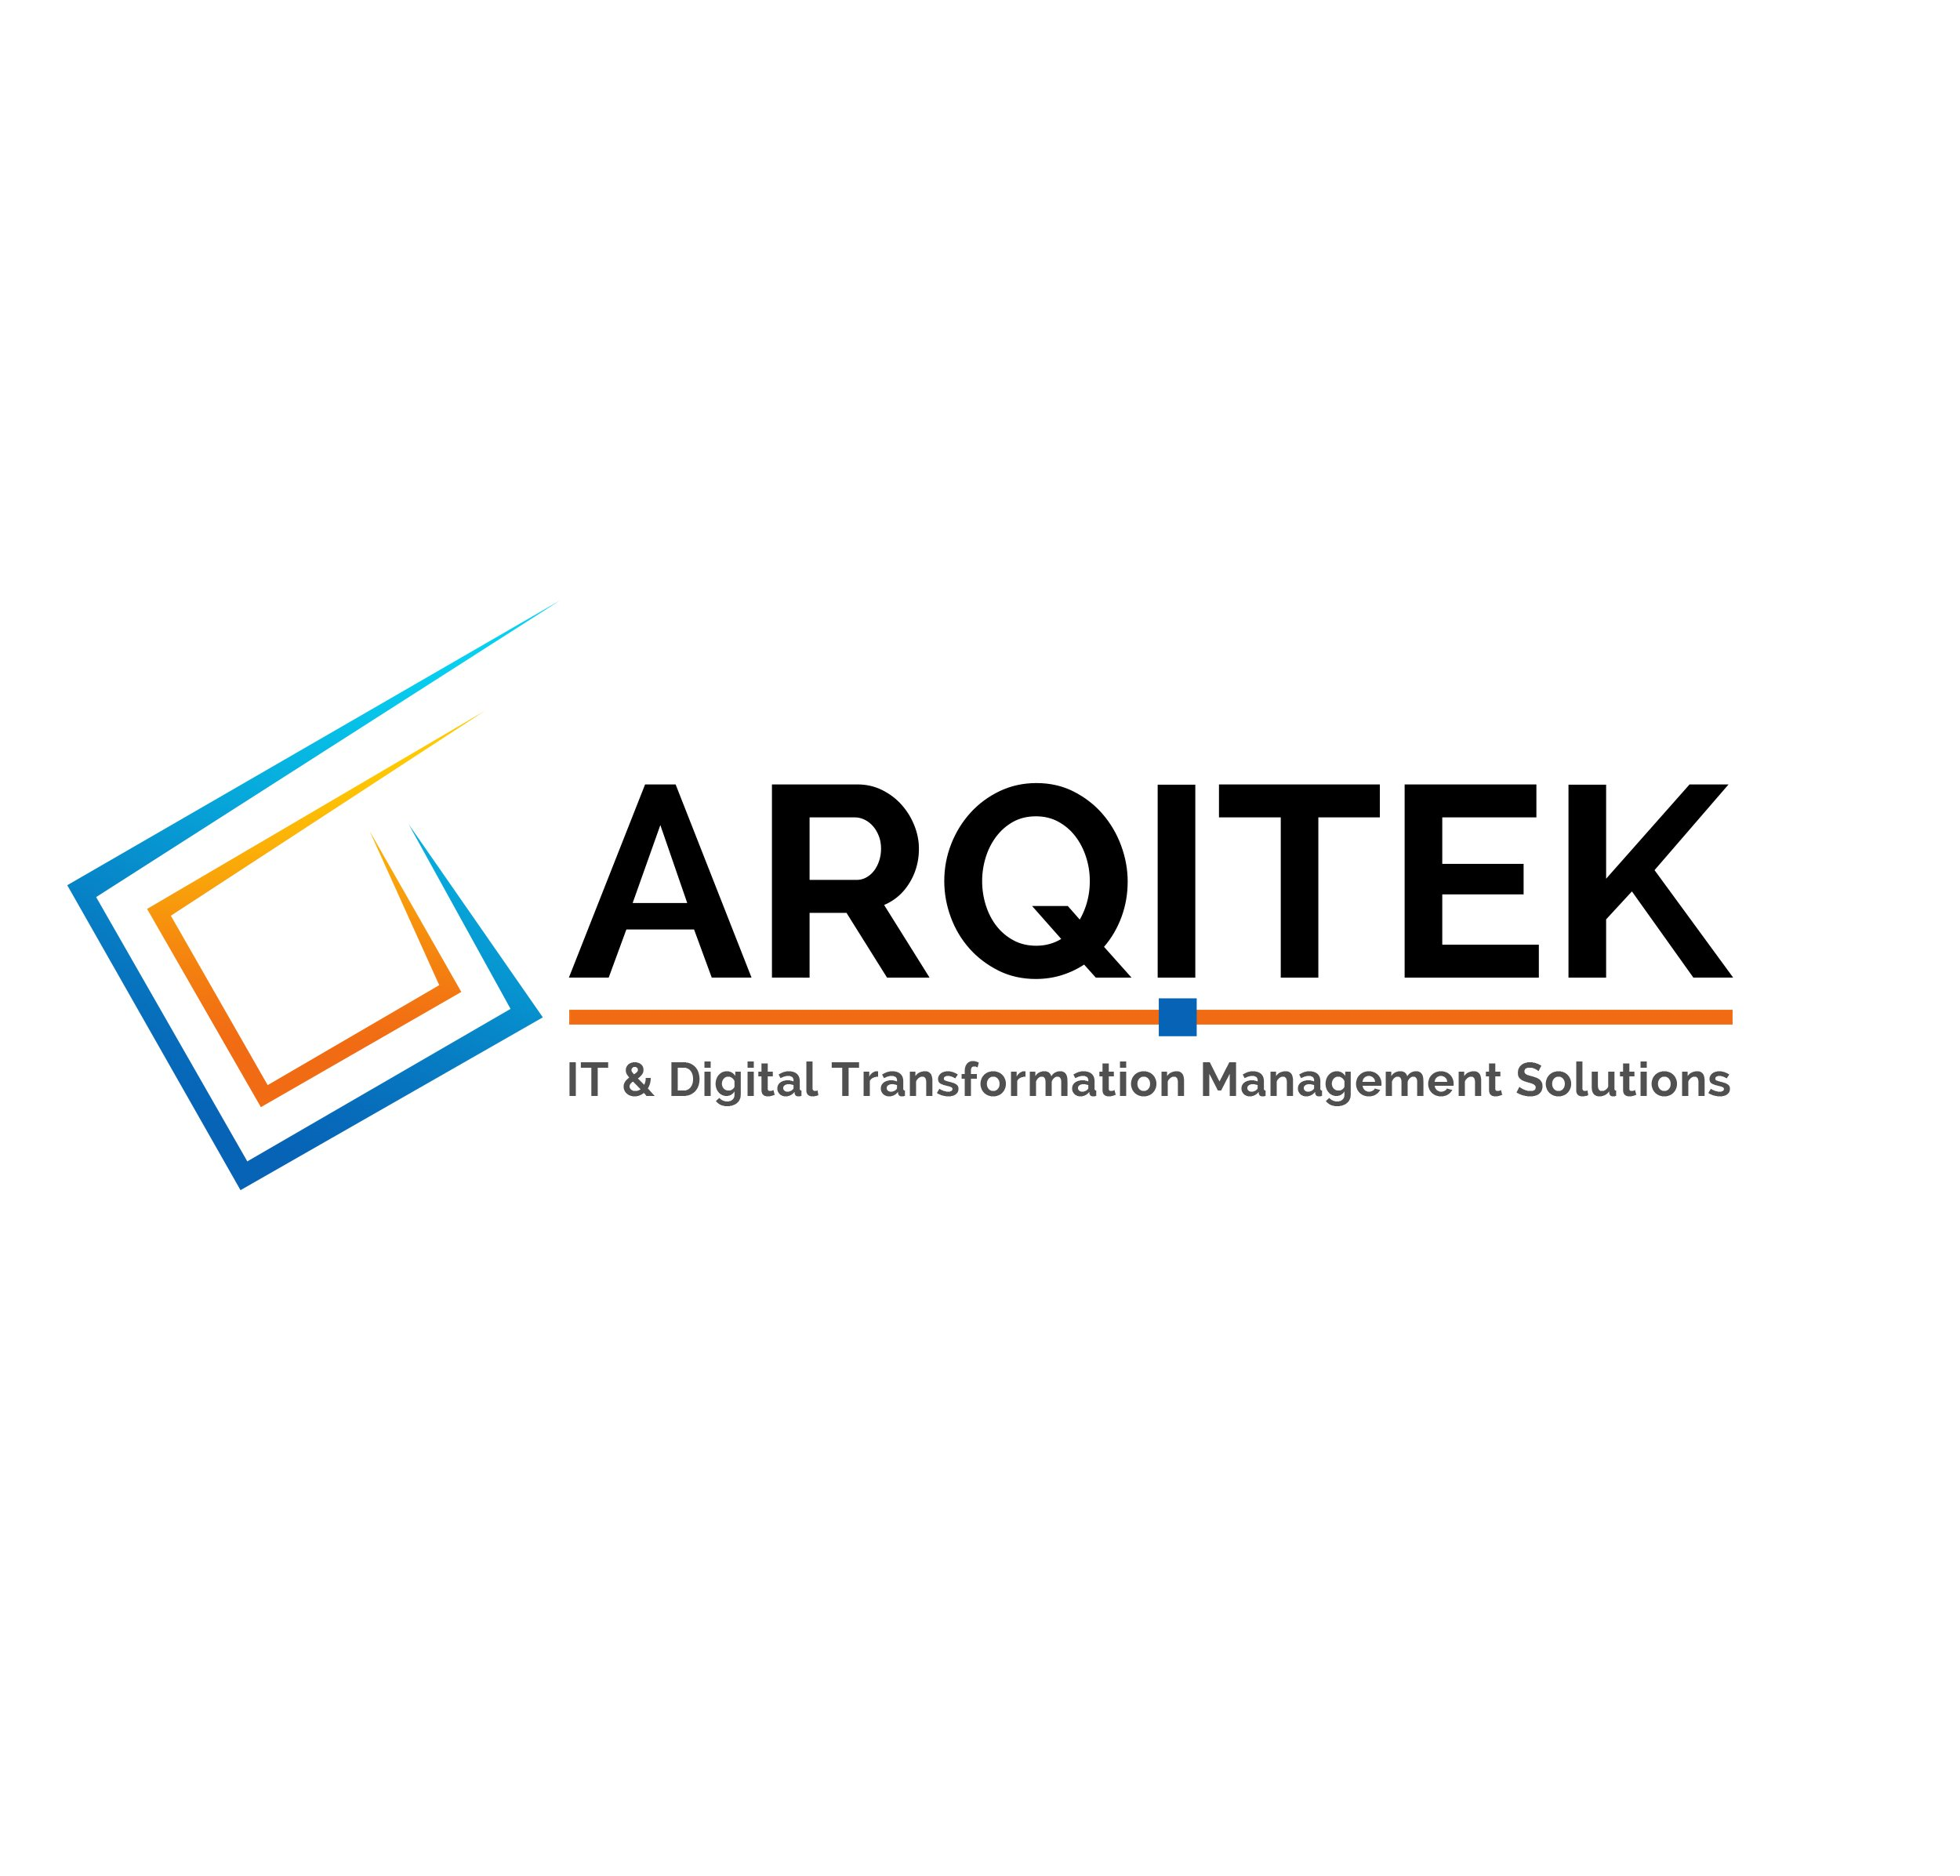 ARQITEK new